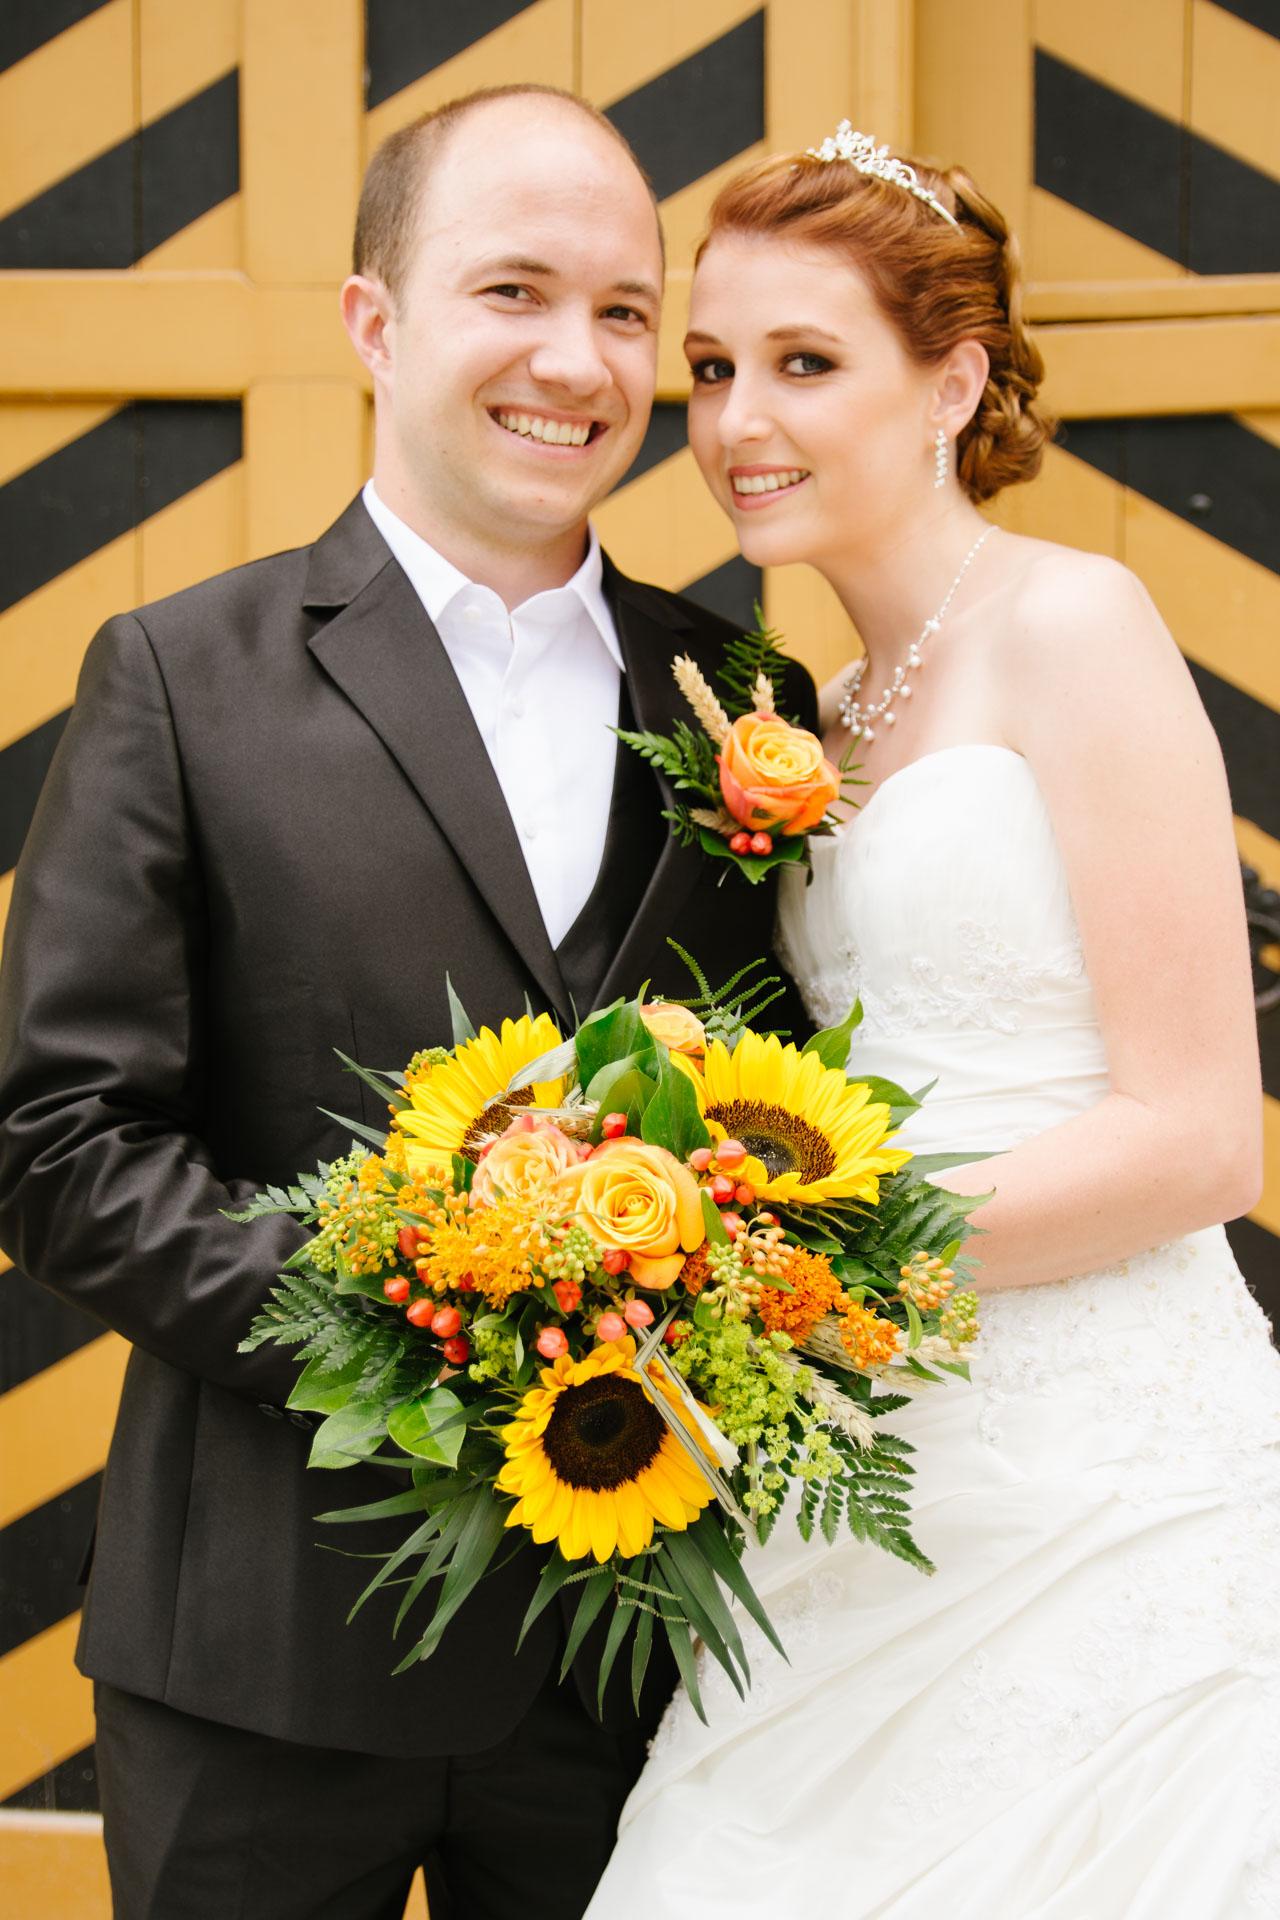 Pixelart_Hochzeitsfotografen_Loerrach_Rheinfelden_Hallwil_Schweiz_Linda-Ramon-1003